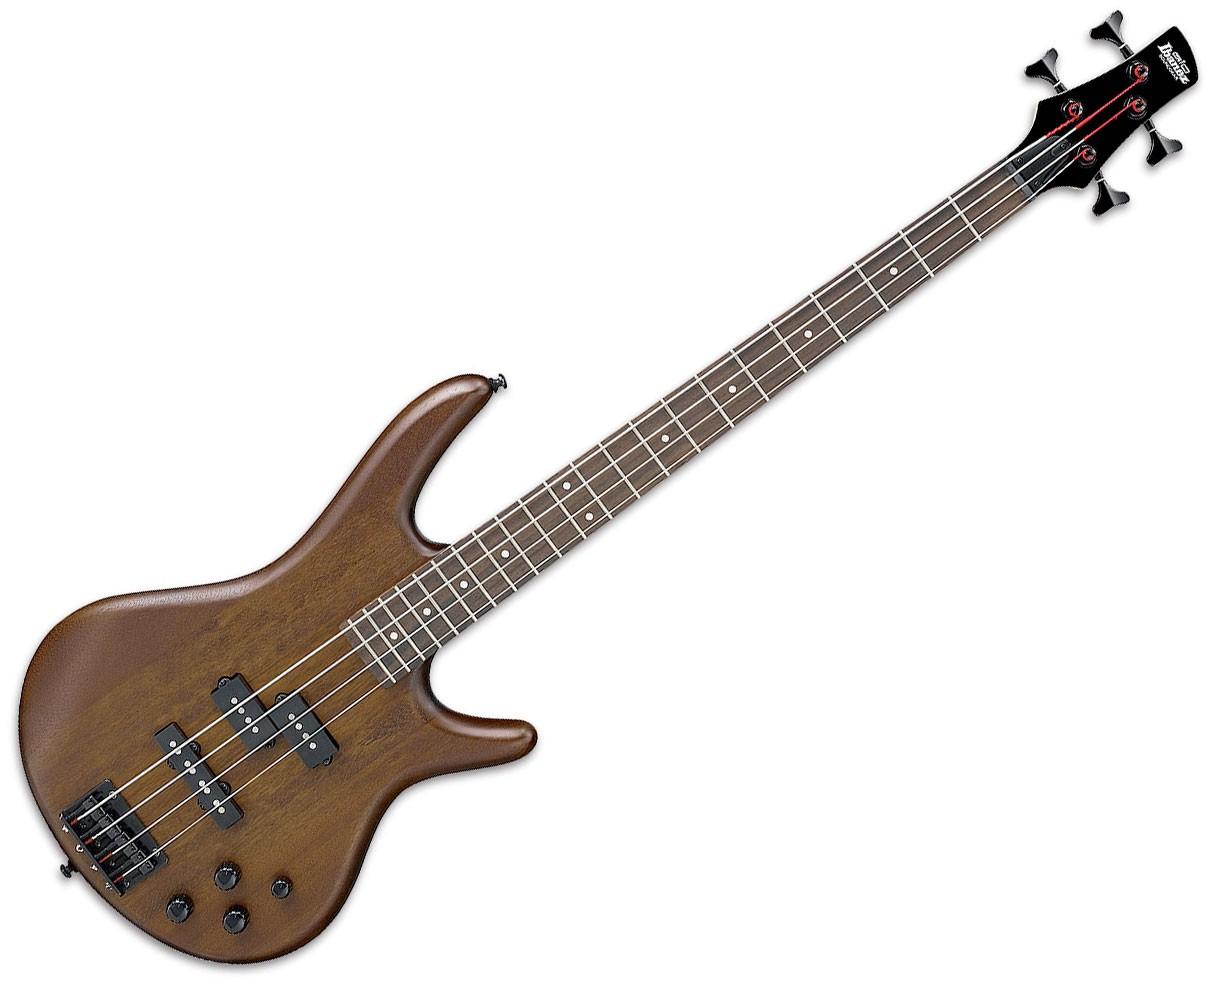 Ibanez GSR200B GSR Series 4-String Bass Guitar - Walnut Flat